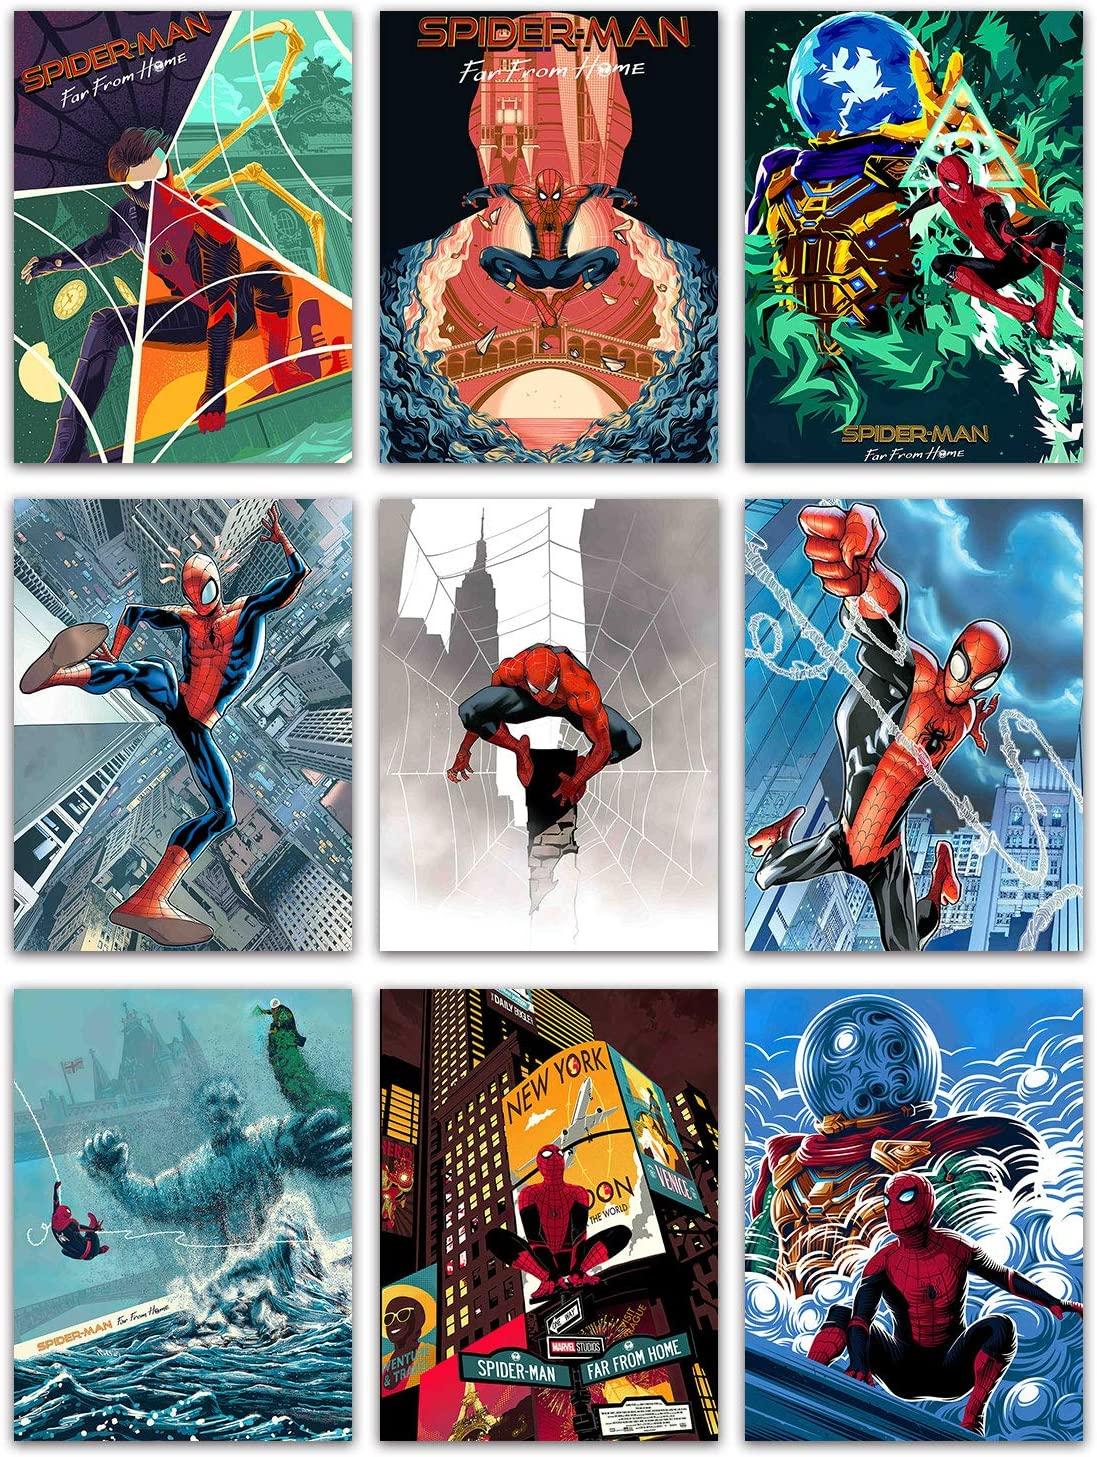 Spiderman Printed Wall Art Poster - Set of 9, (18